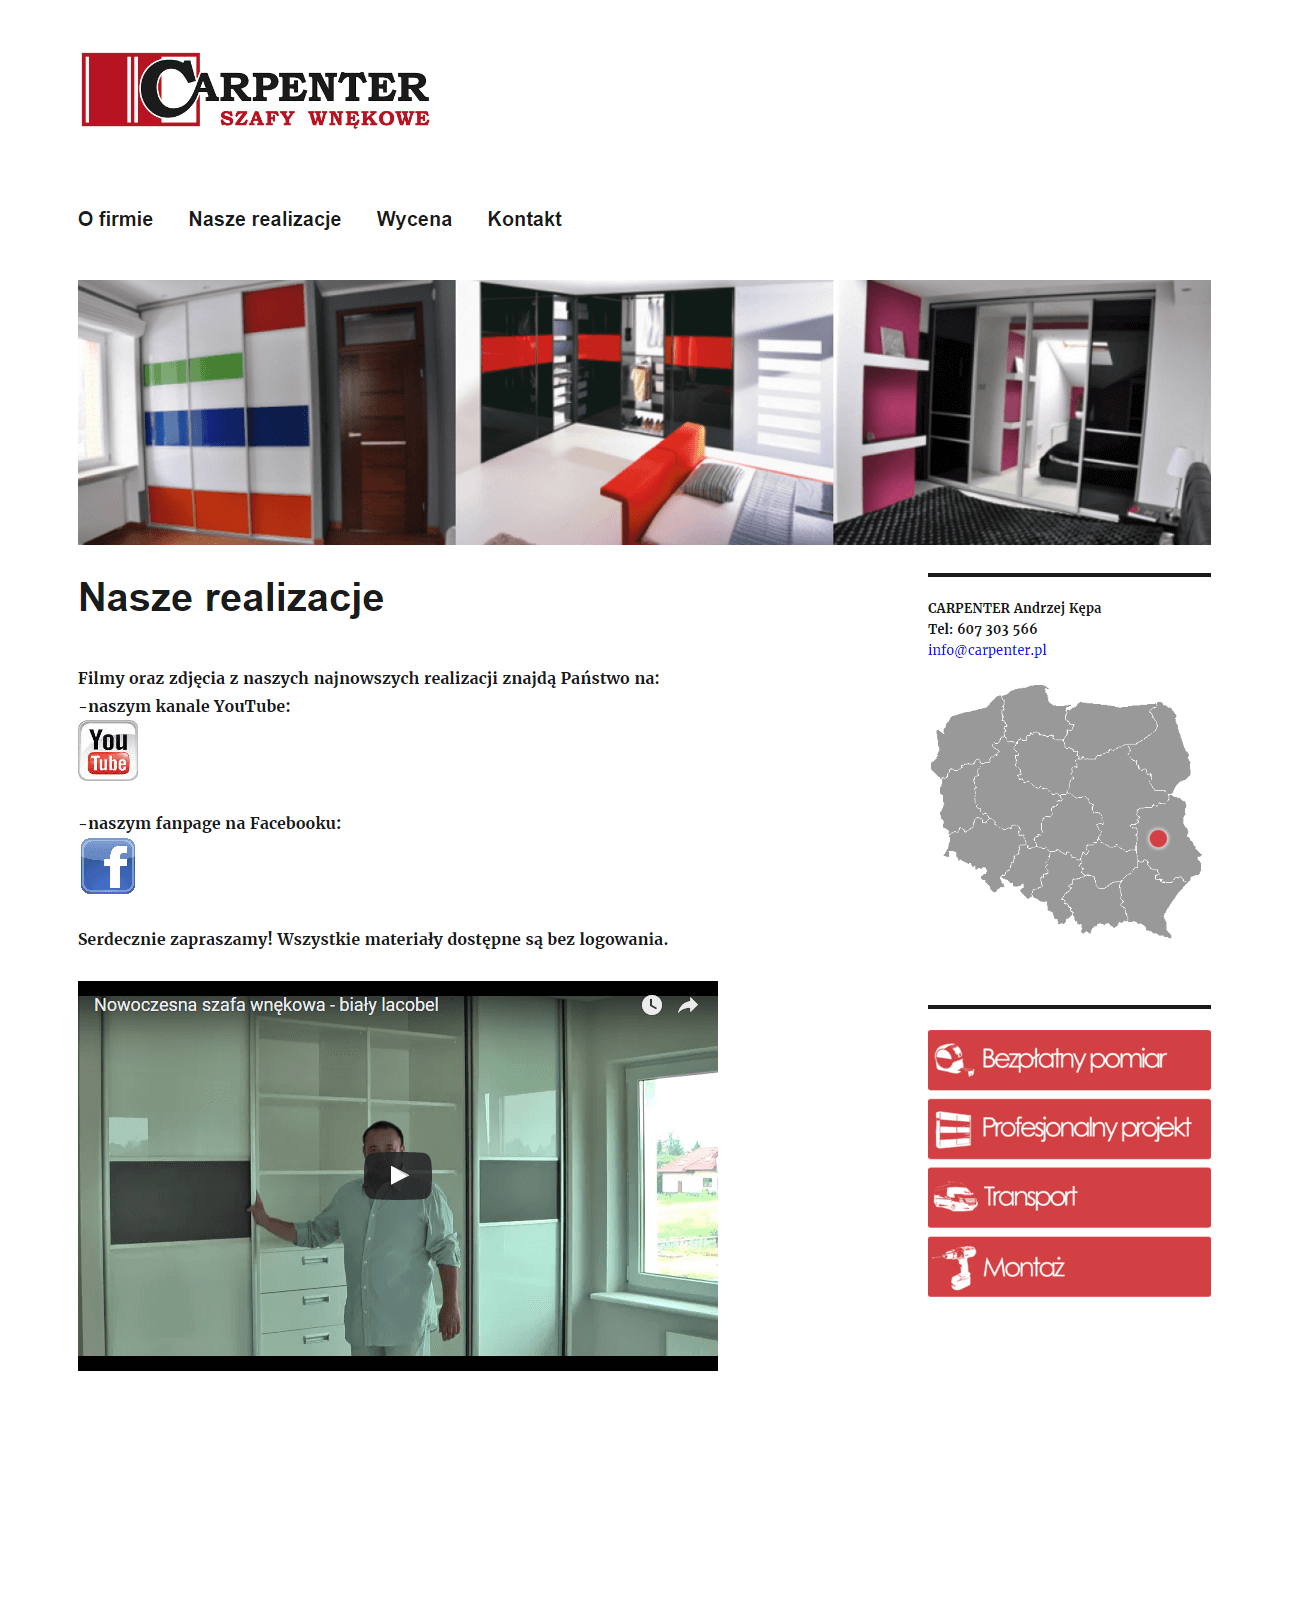 2015-10 Business Identity migration to WordPress – carpenter.pl